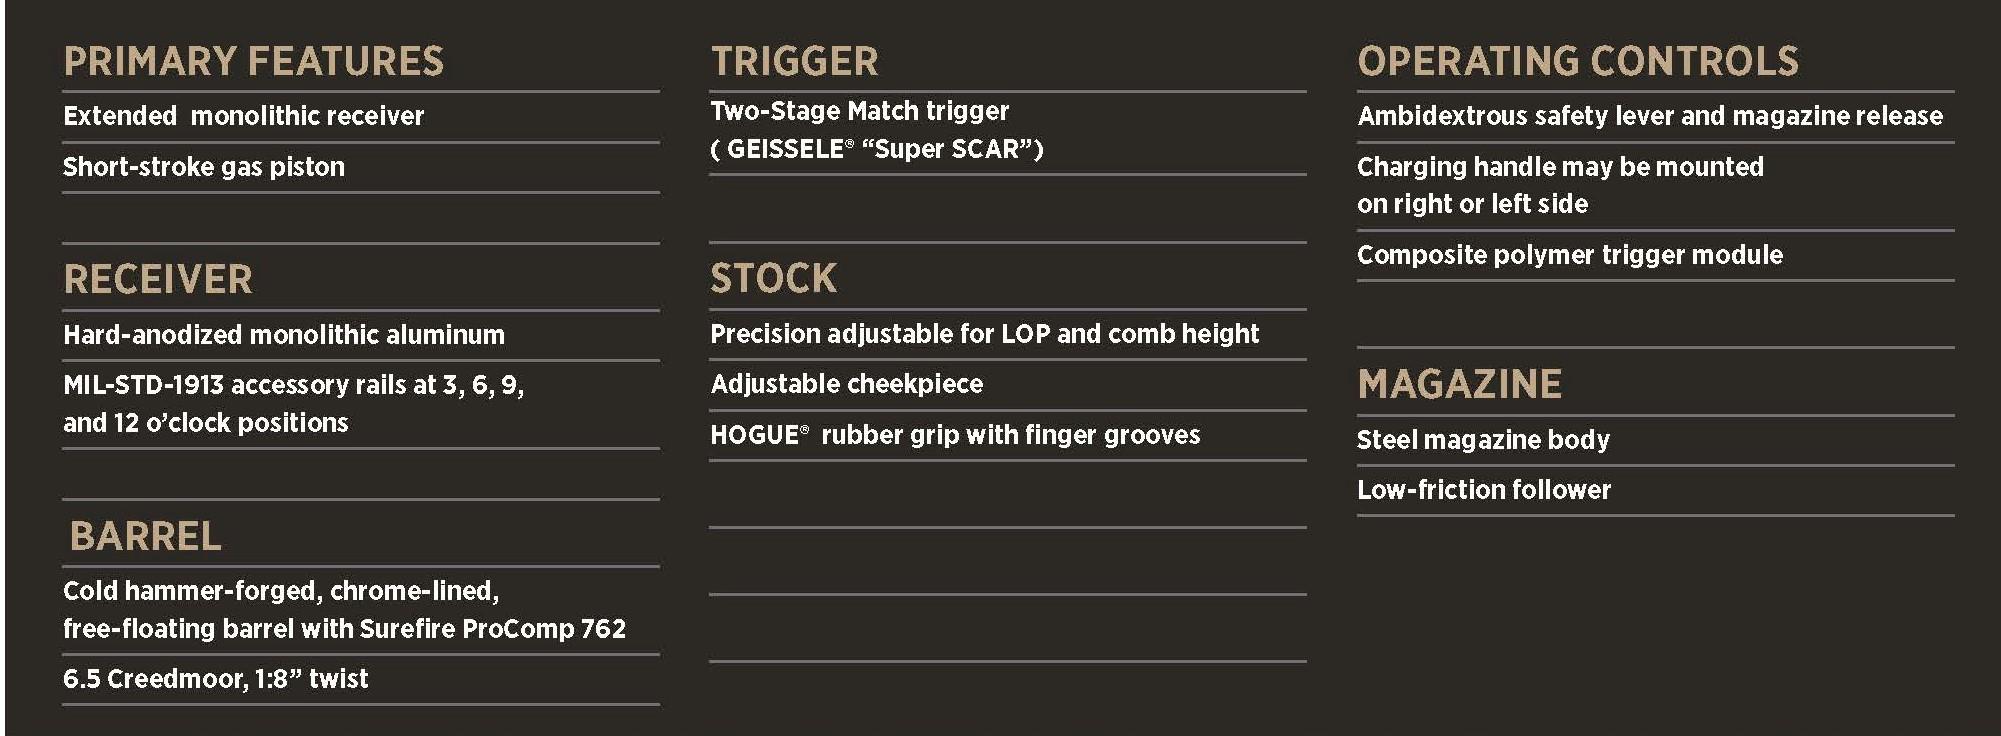 FN SCAR 20s 6.5 CM product specs